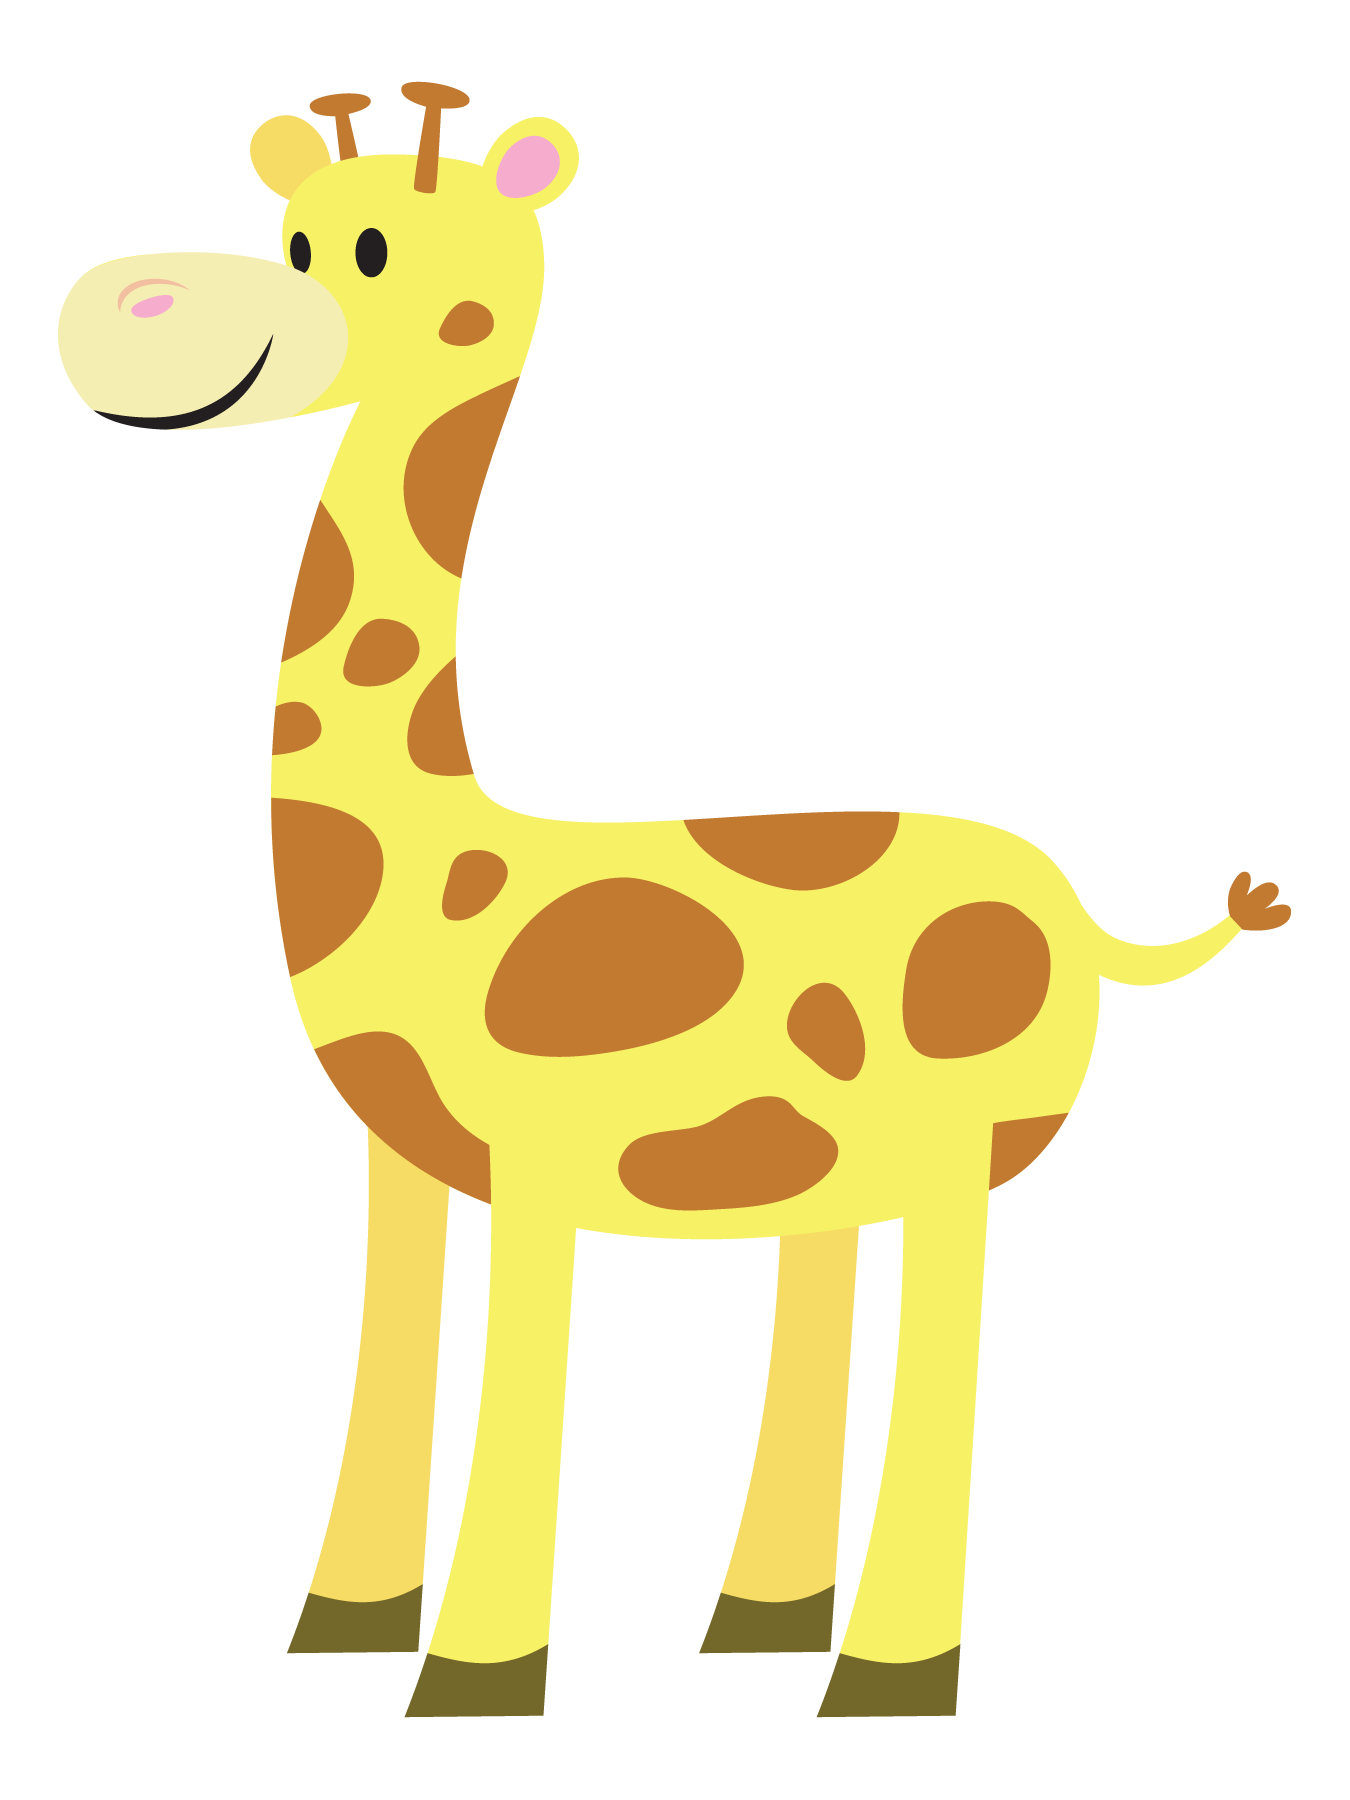 Giraffe clipart #12, Download drawings